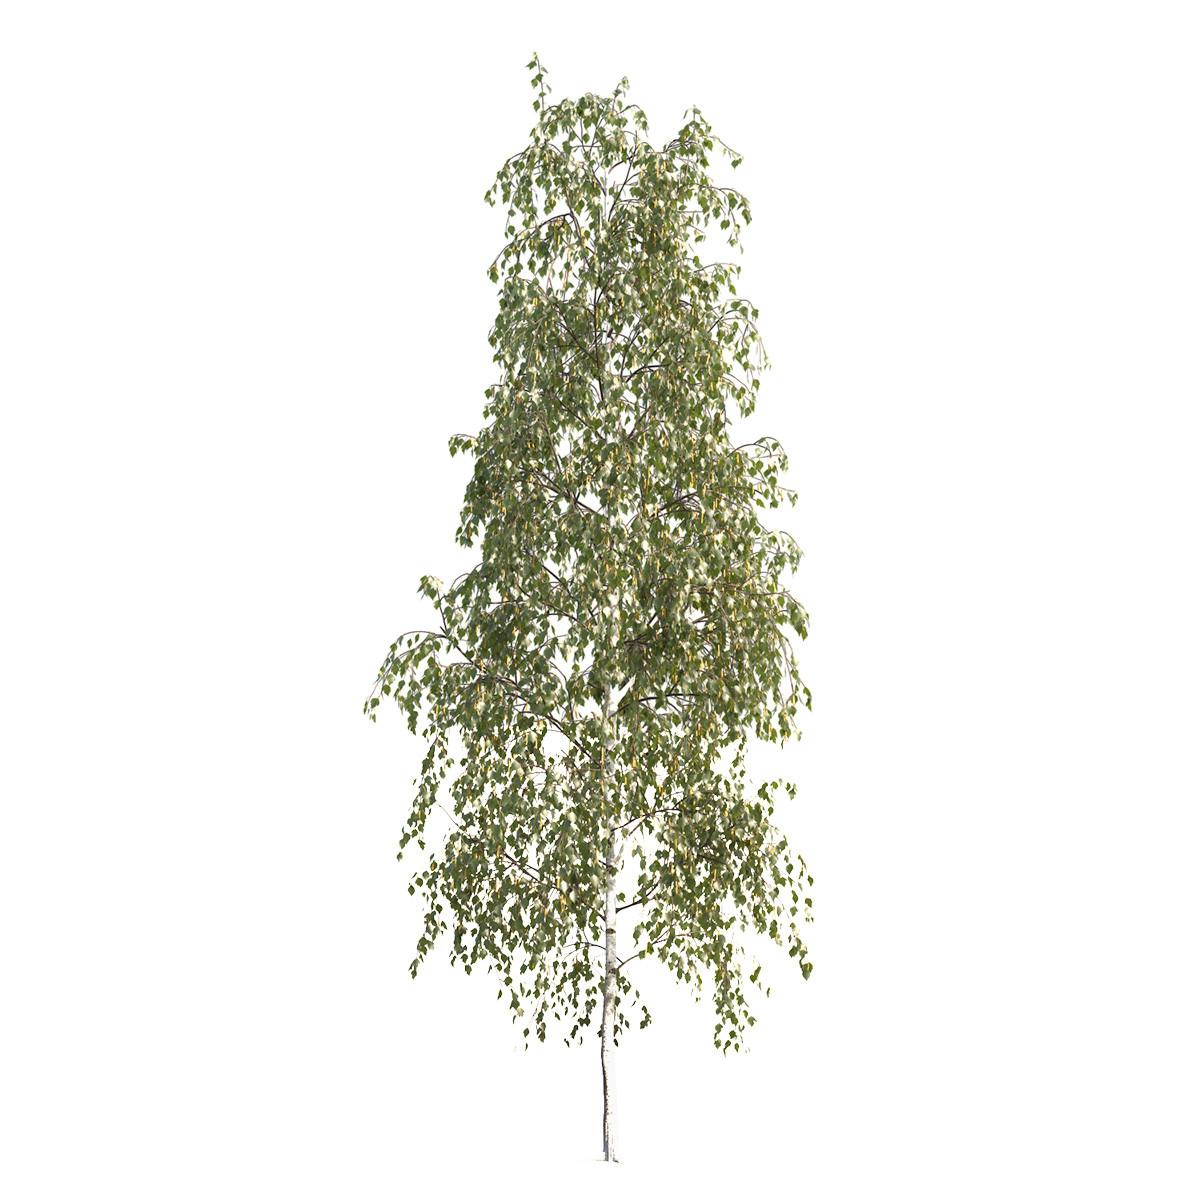 Vizport_HD_Tree_Betula_pendula_101SU_01.jpg